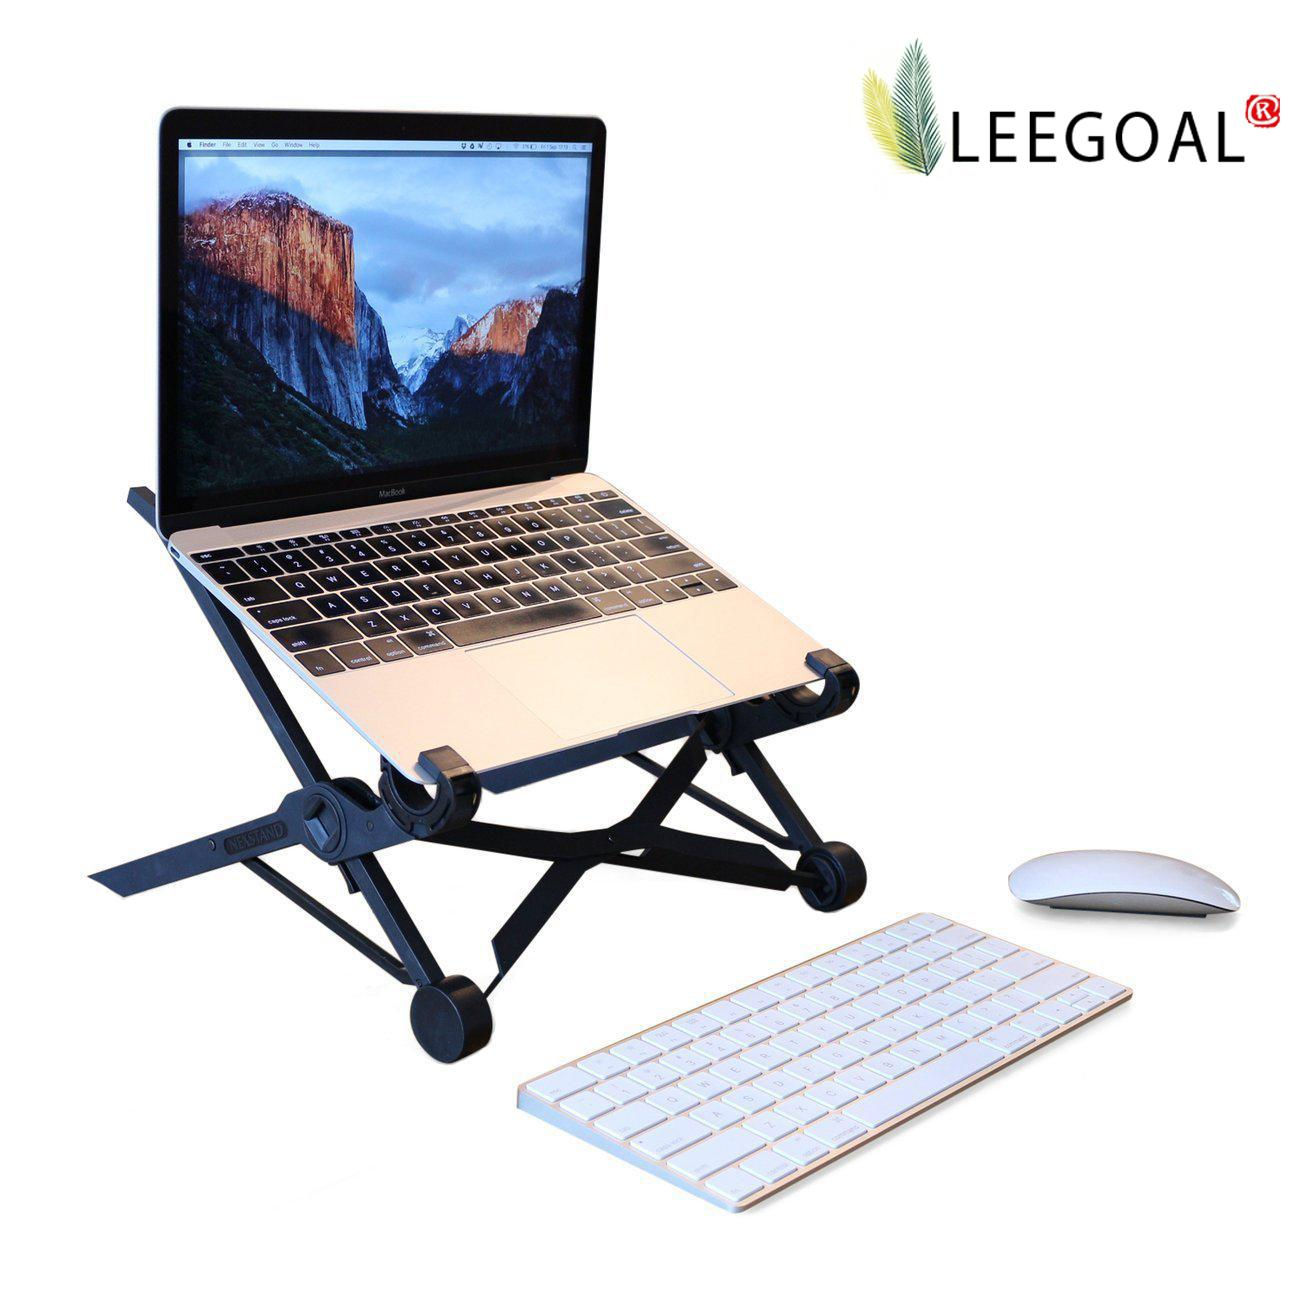 leegoal NEXSTAND™ K2 Laptop Stand Portable Adjustable Eye-Level Ergonomic For Apple MacBook PC Laptop